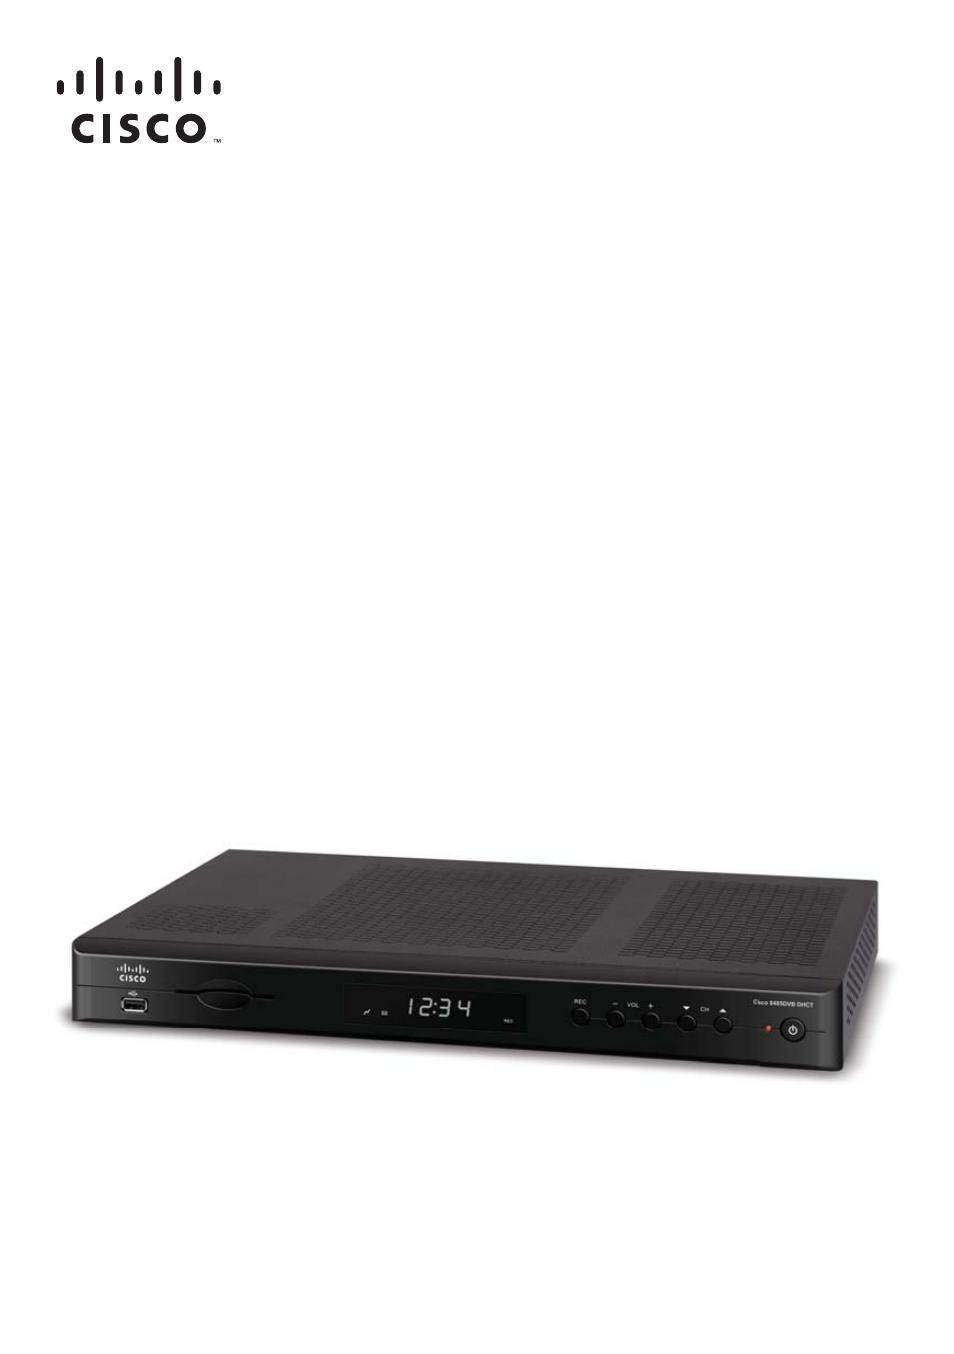 Cisco 8485dvb Hd Dvr Manual Pdf